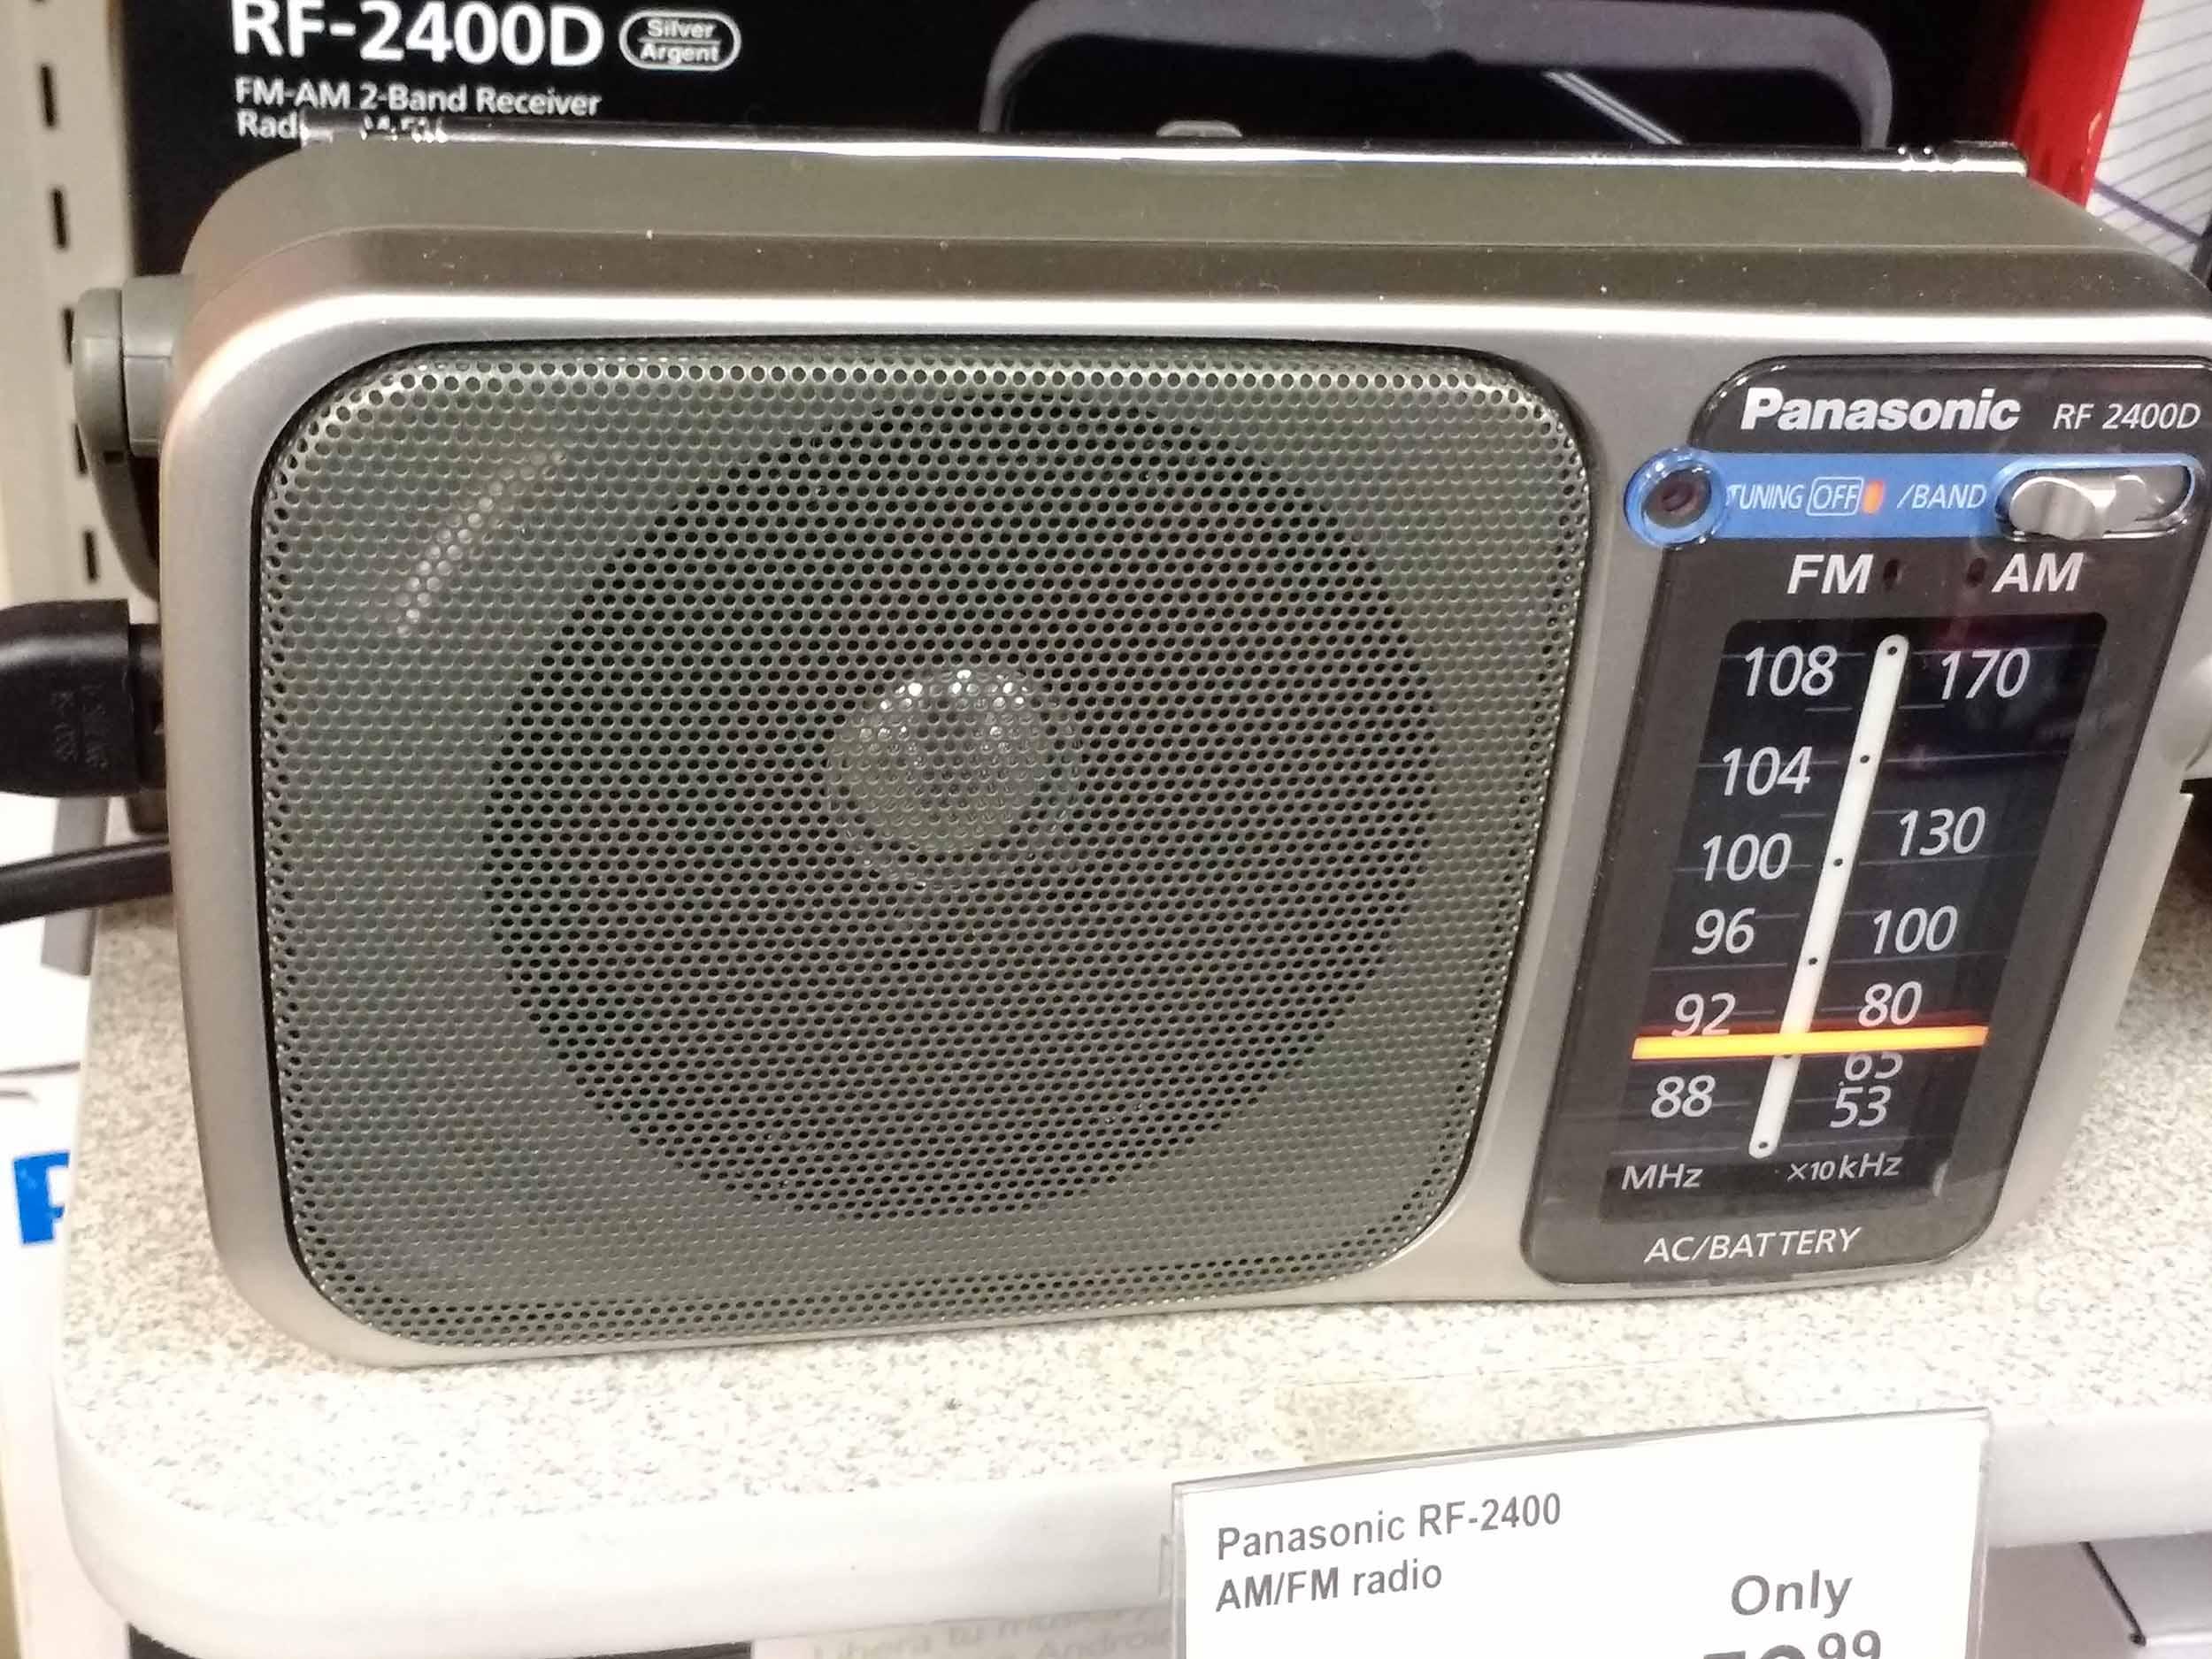 We carry brand name radios like this Panasonic.